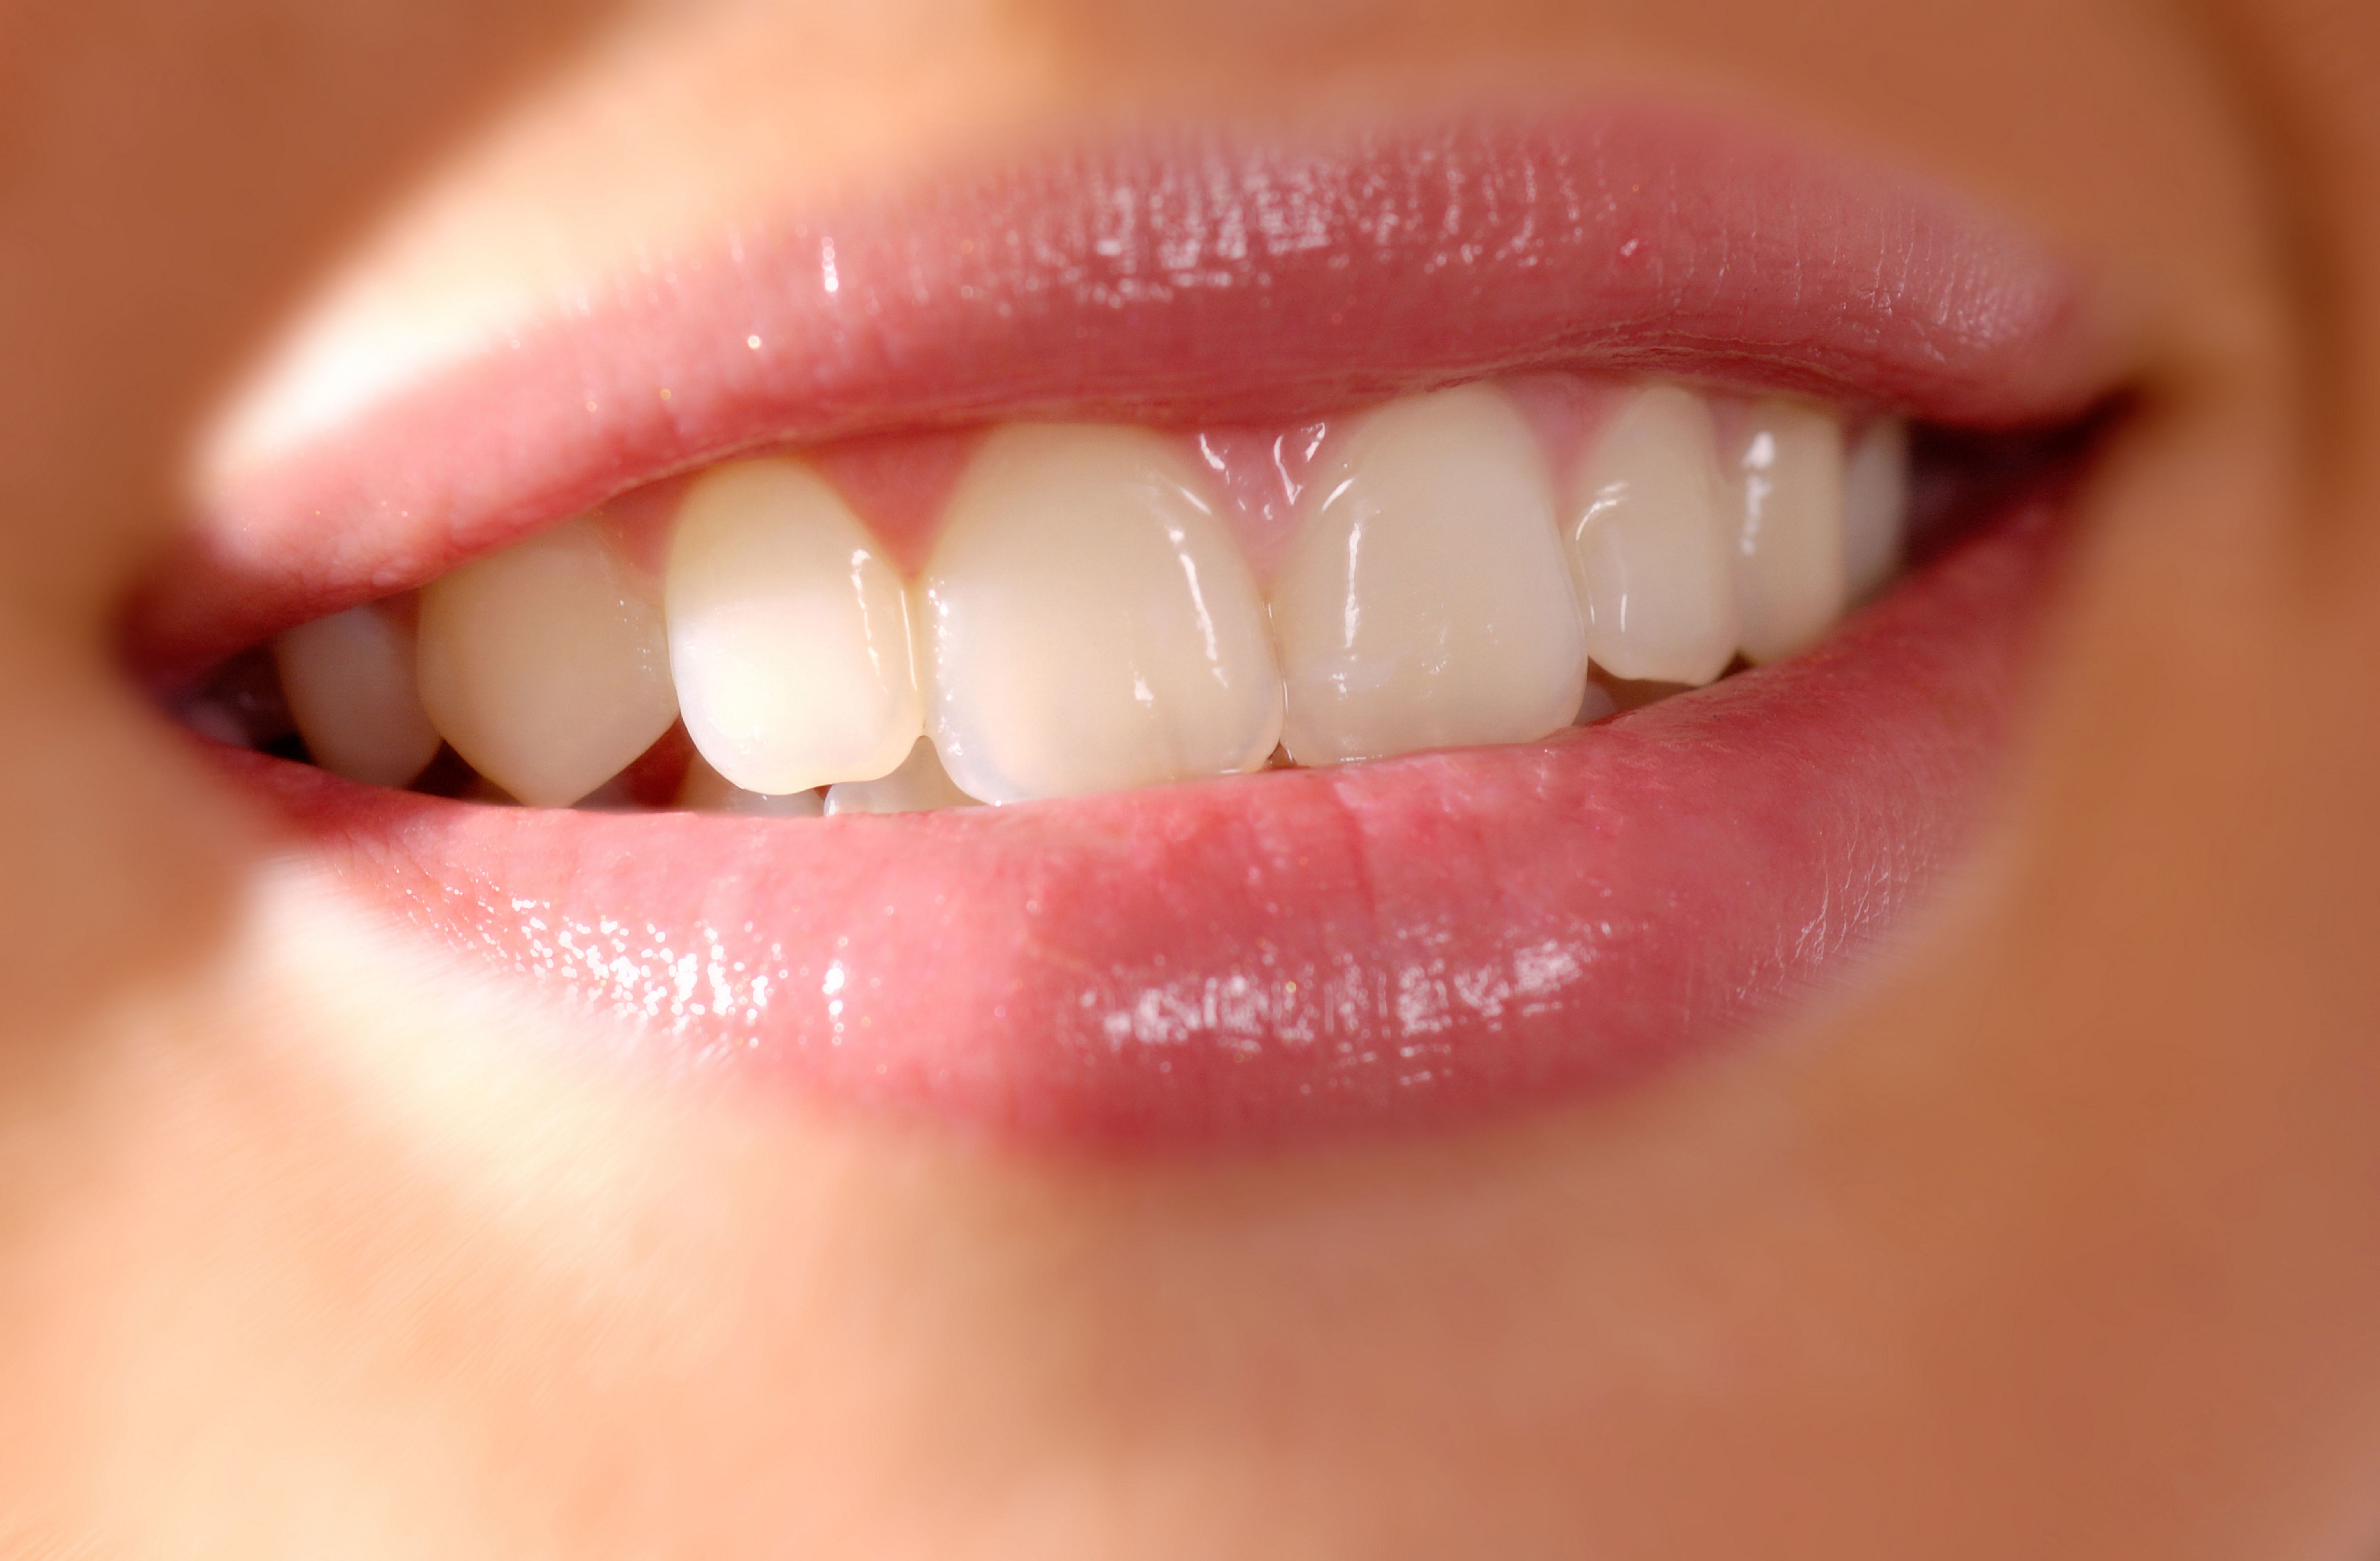 Clinicas dentales en el Eixample Barcelona|Clinica Esteve Padrós